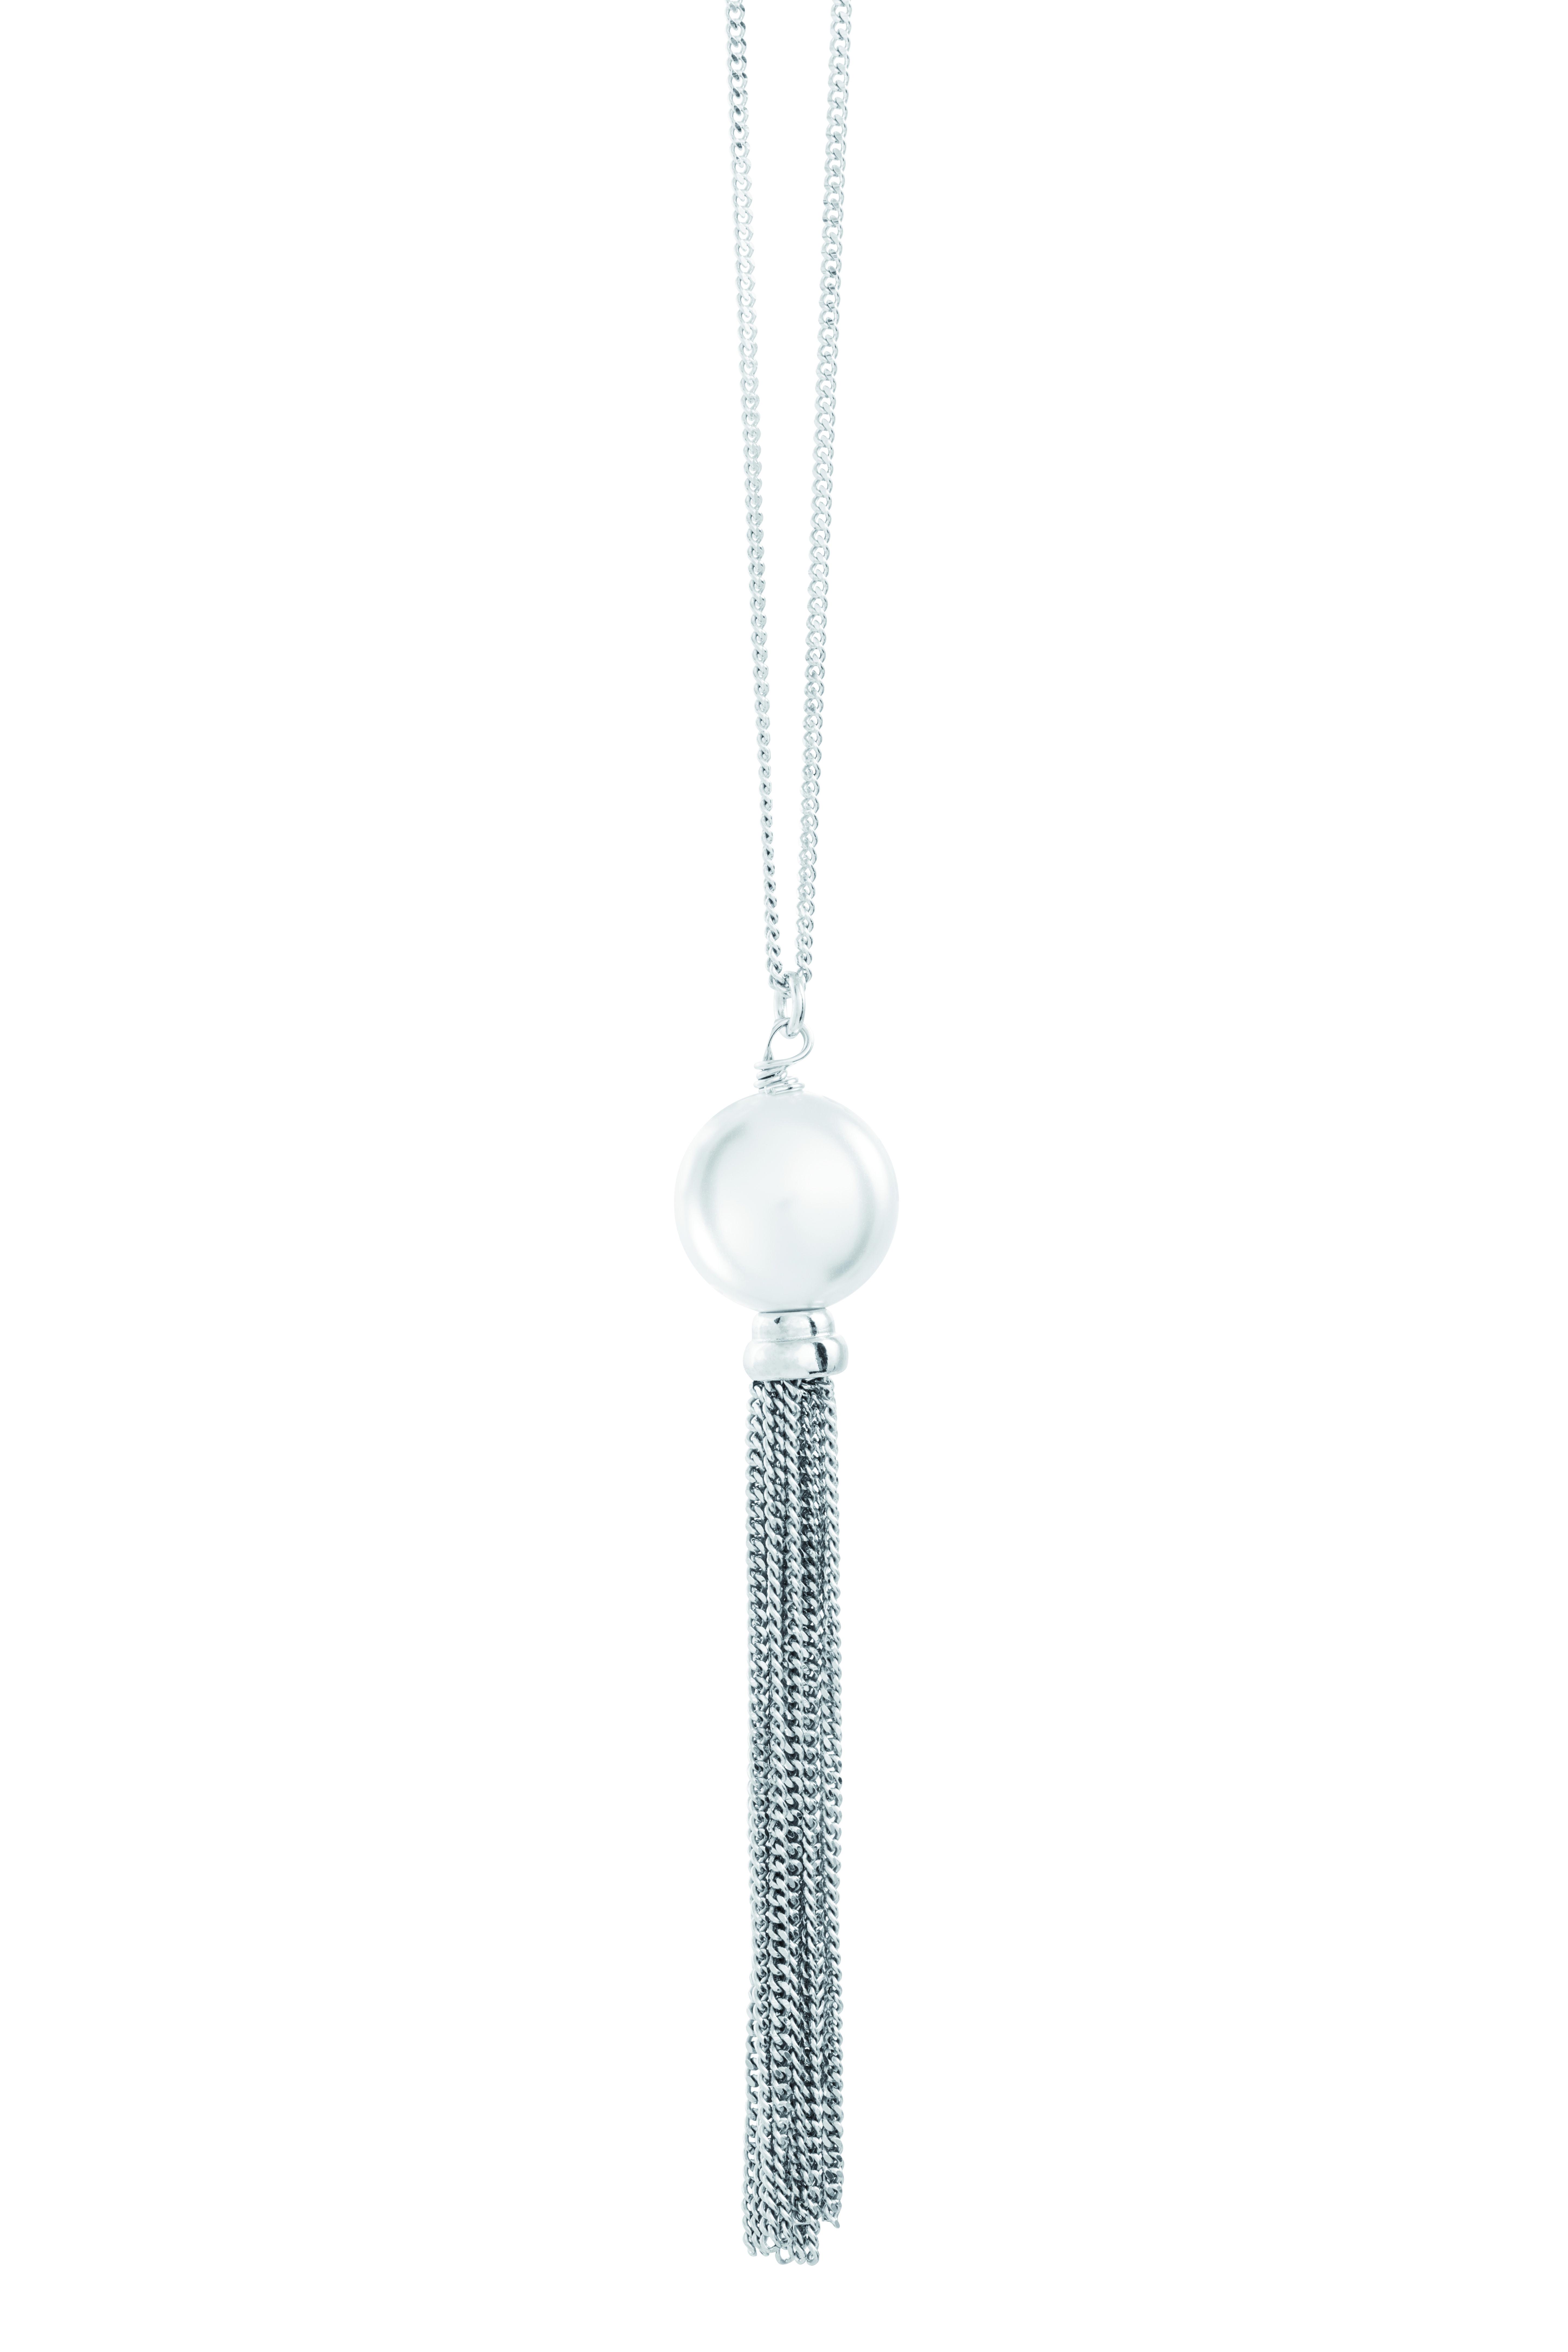 4a5ed354aee90 Collier en argent massif et perle  collier  argent  fantaisie  bijoux   diamantor